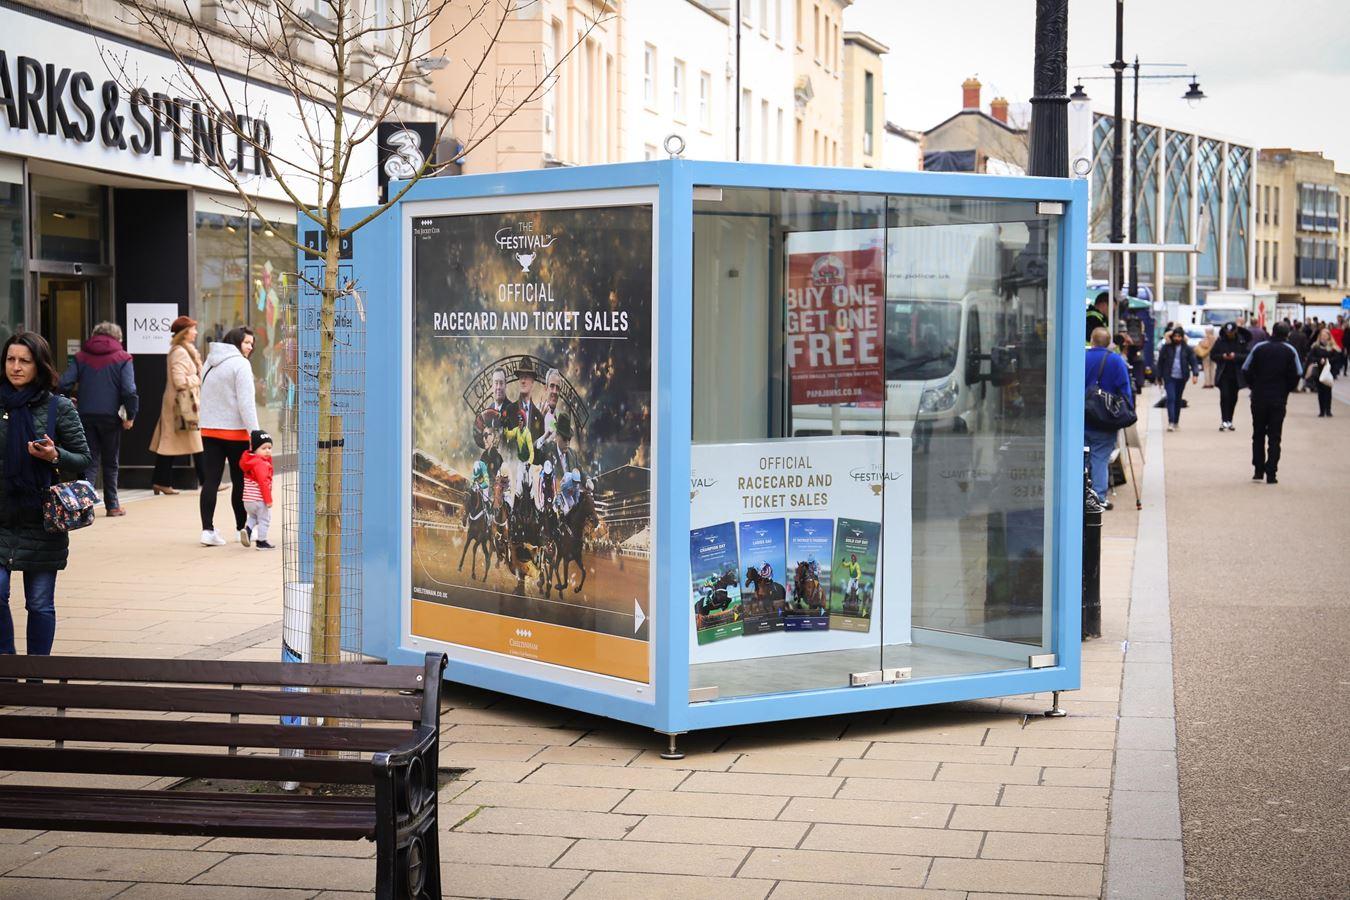 cheltenham-festival-uk-contra-vision-inspire-architects